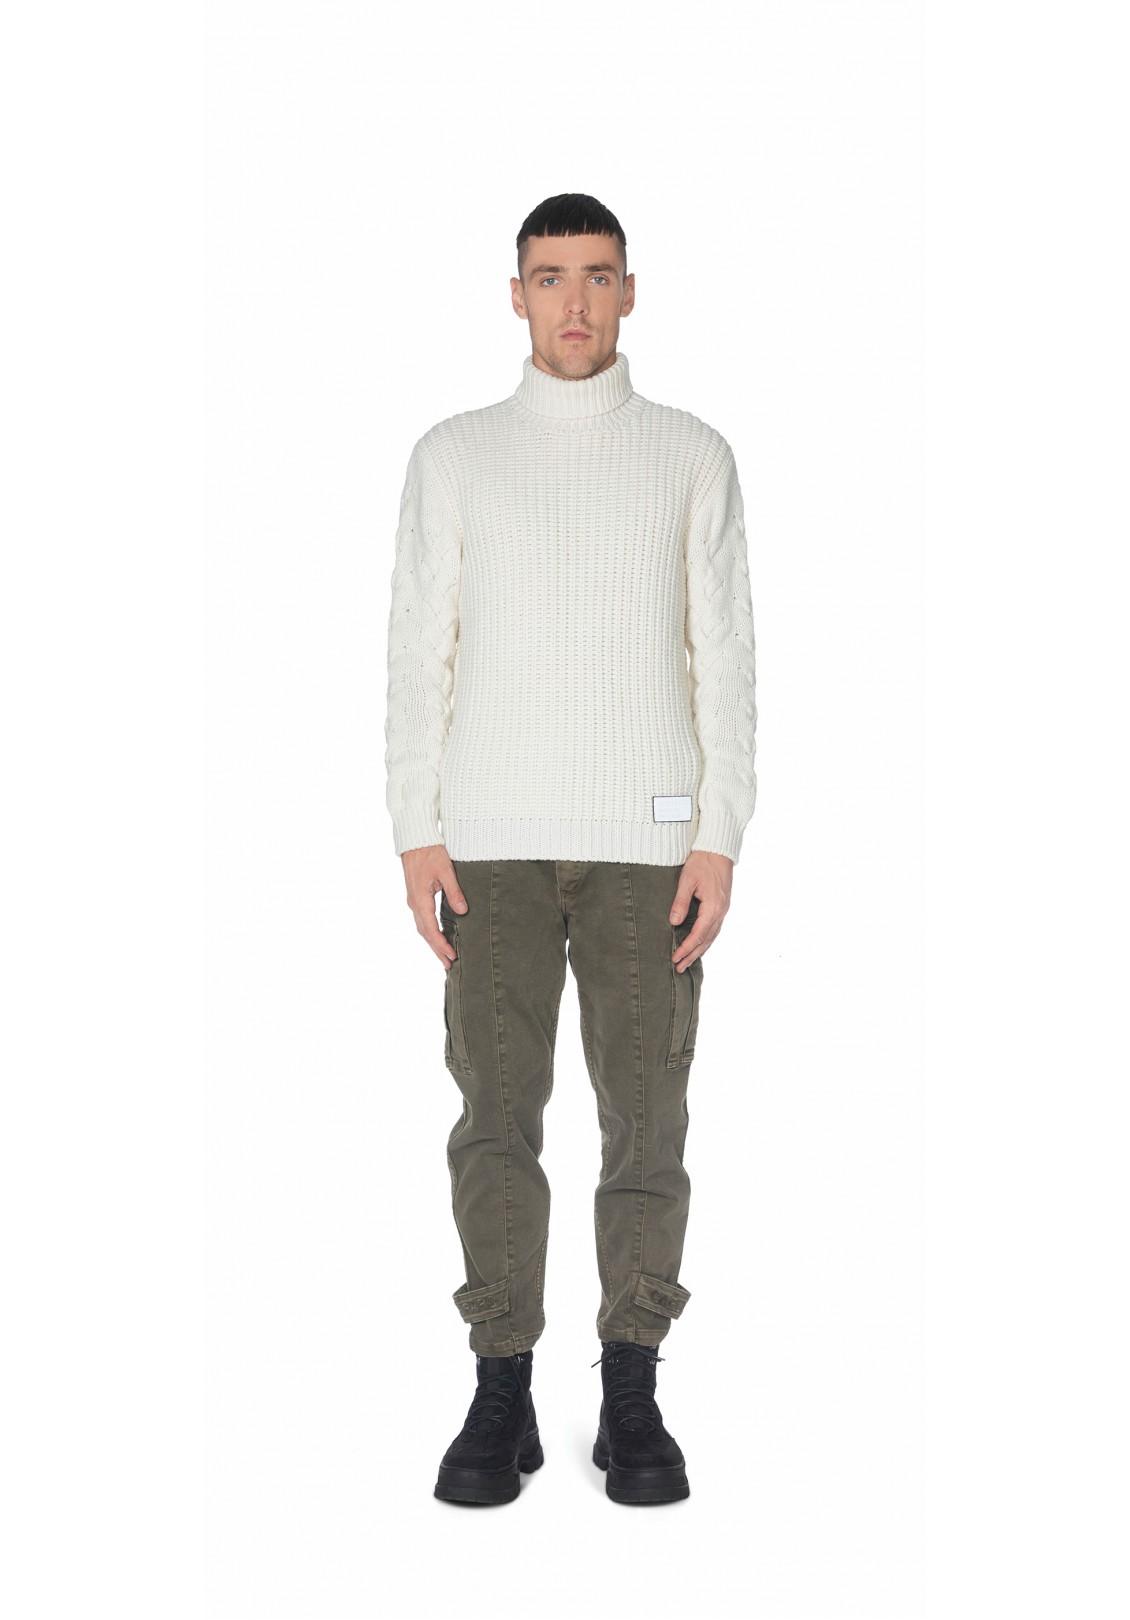 GAELLE | Shirt2 | GBU29334800